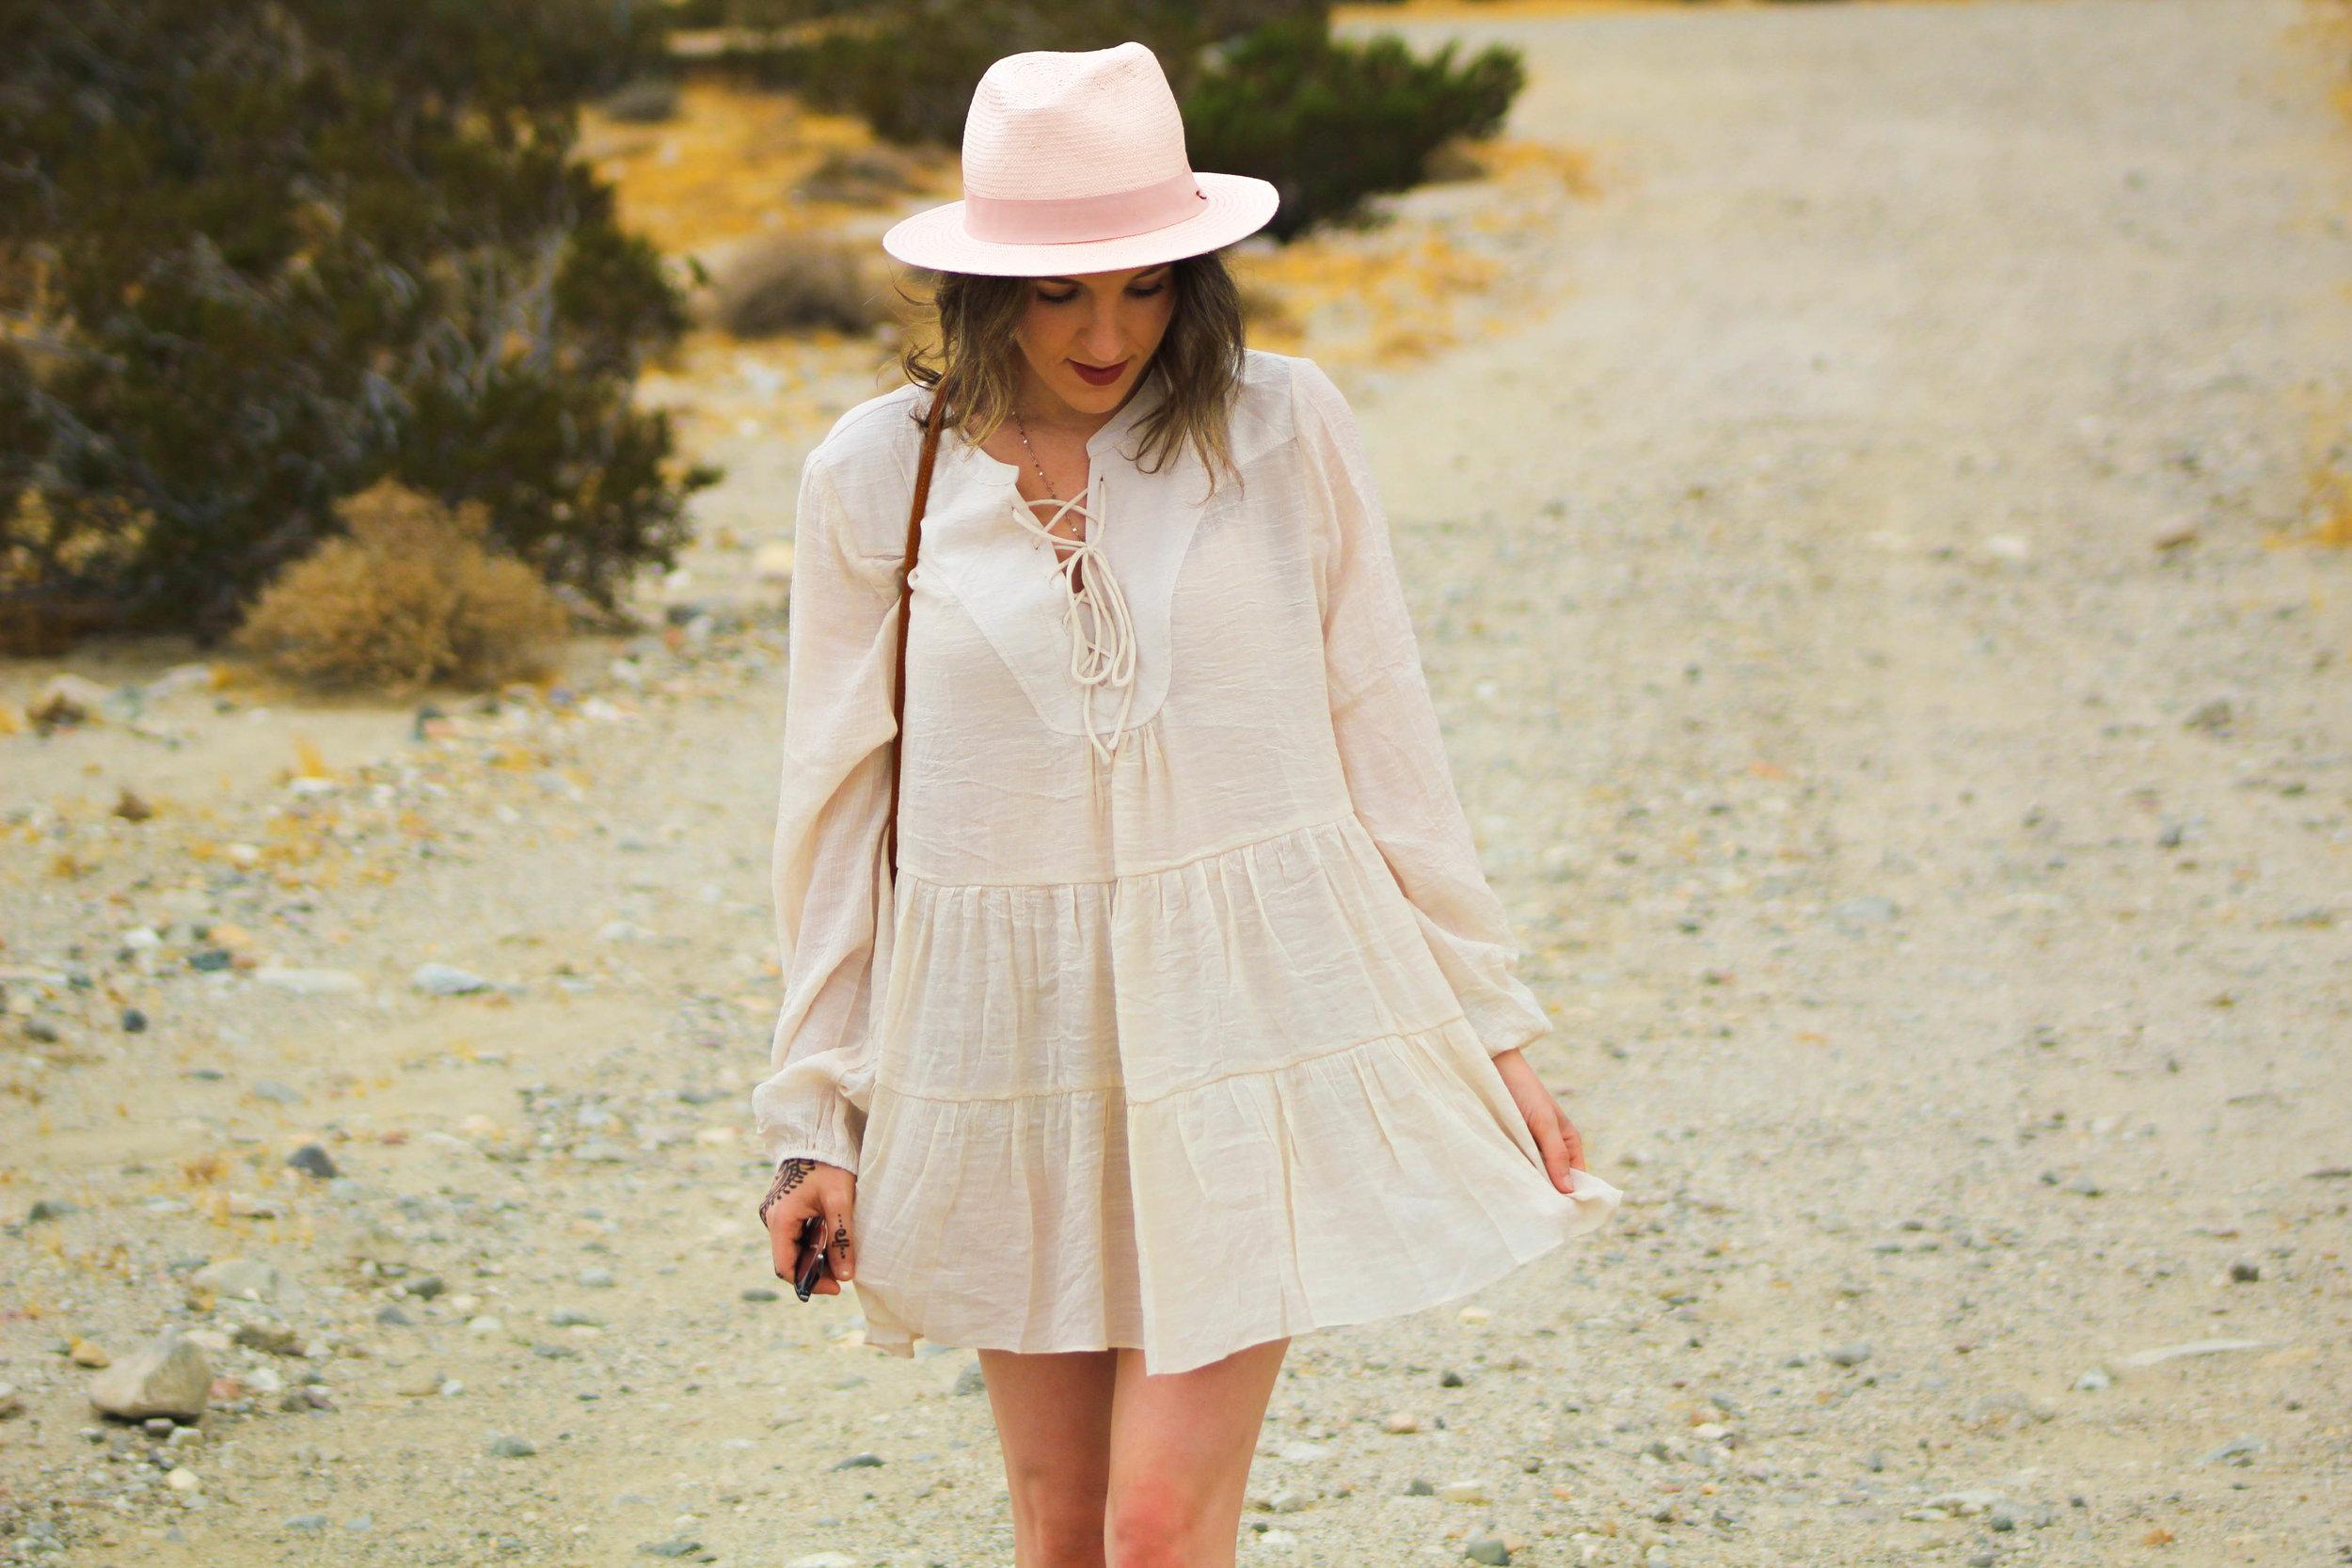 Shirt (worn as dress): Heavenly Couture, similar   here   // Hat:   similar here   // Purse: F21,   similar here   // Shoes:   Allegra K // Sunnies:   Marc Jacobs